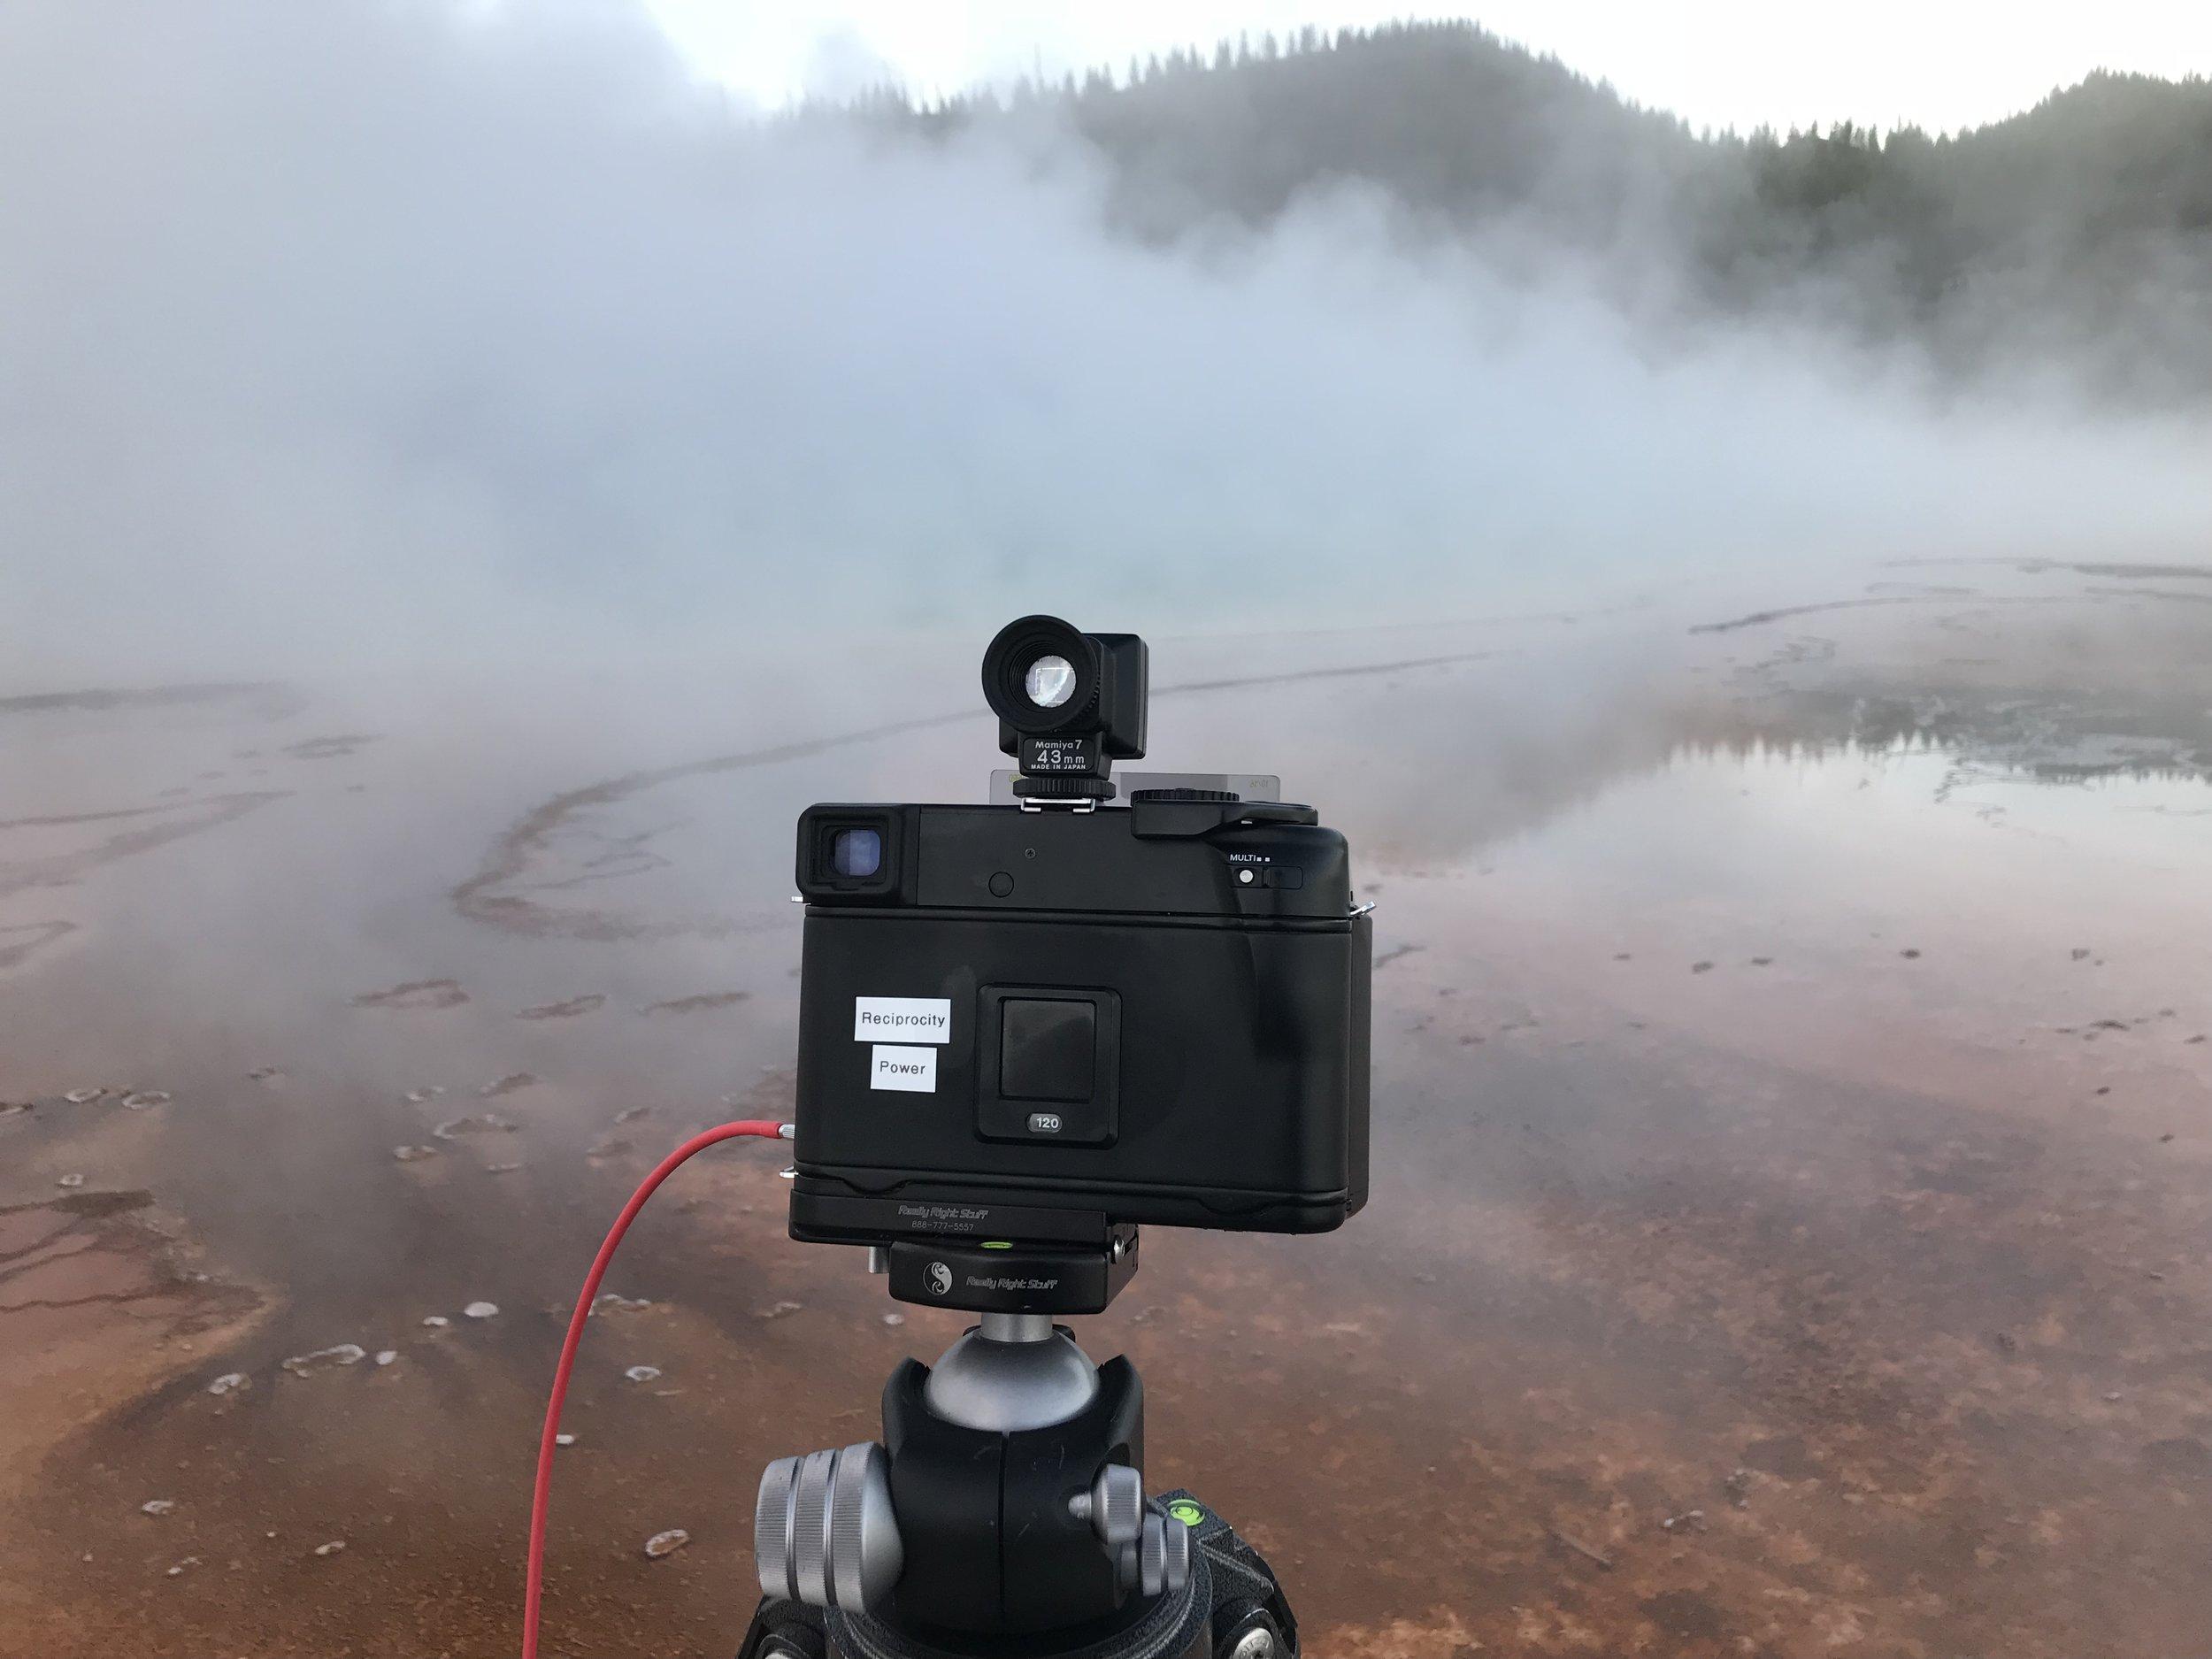 Mamiya 7II, Midway Geyser Basin, Yellowstone Caldera 2018